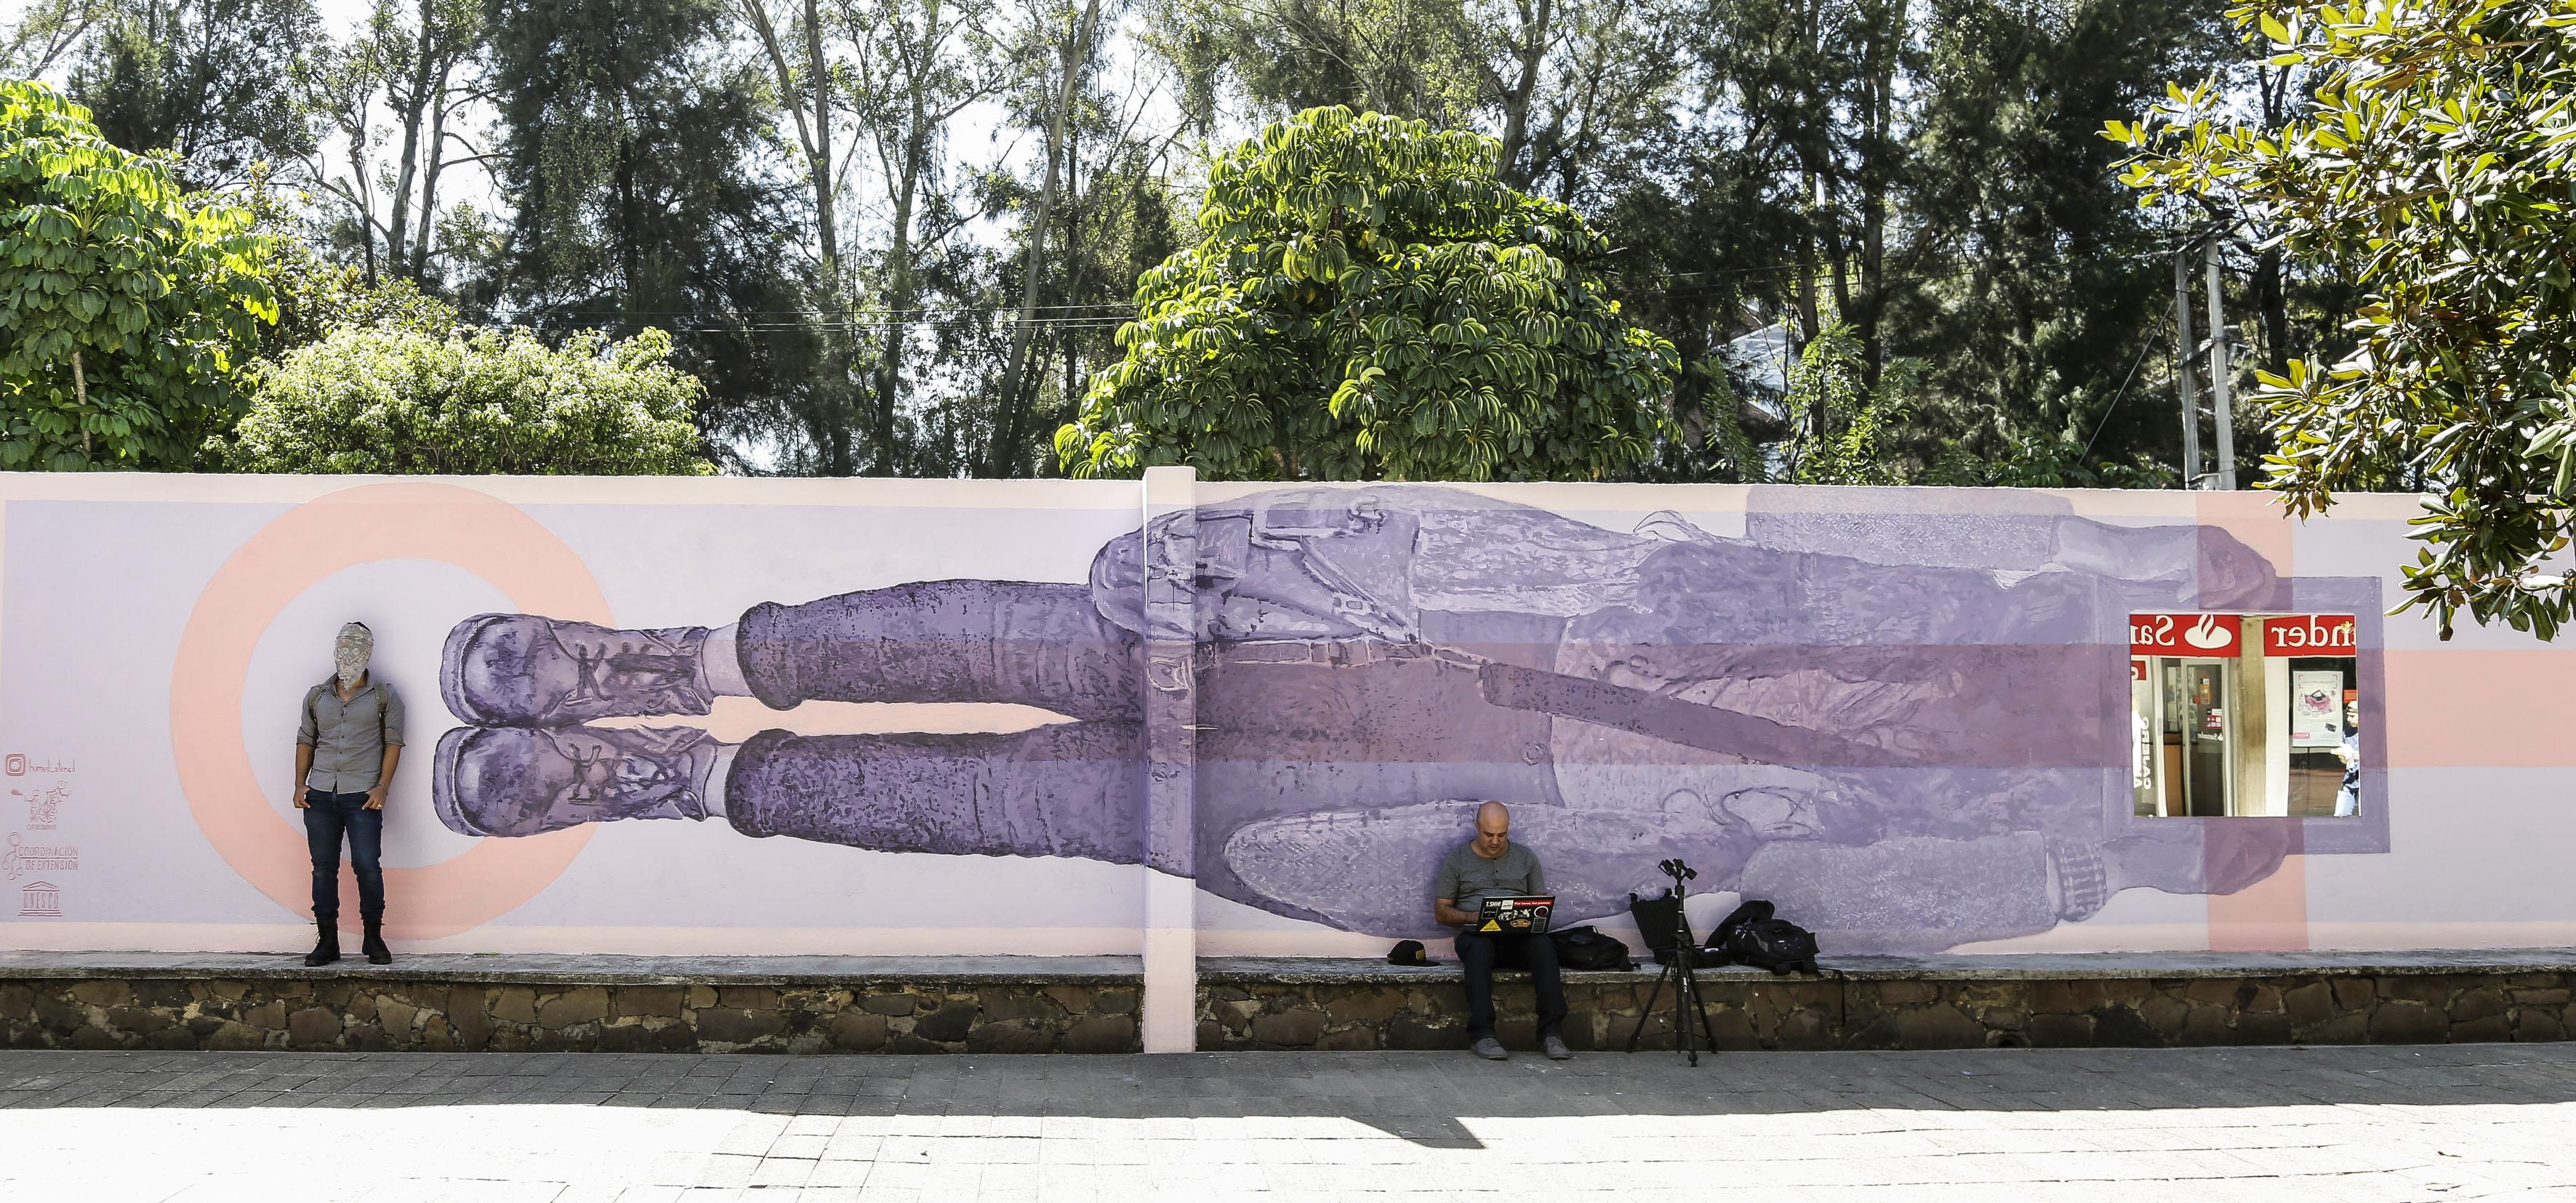 Artista urbano Himed, posando junto a su mural